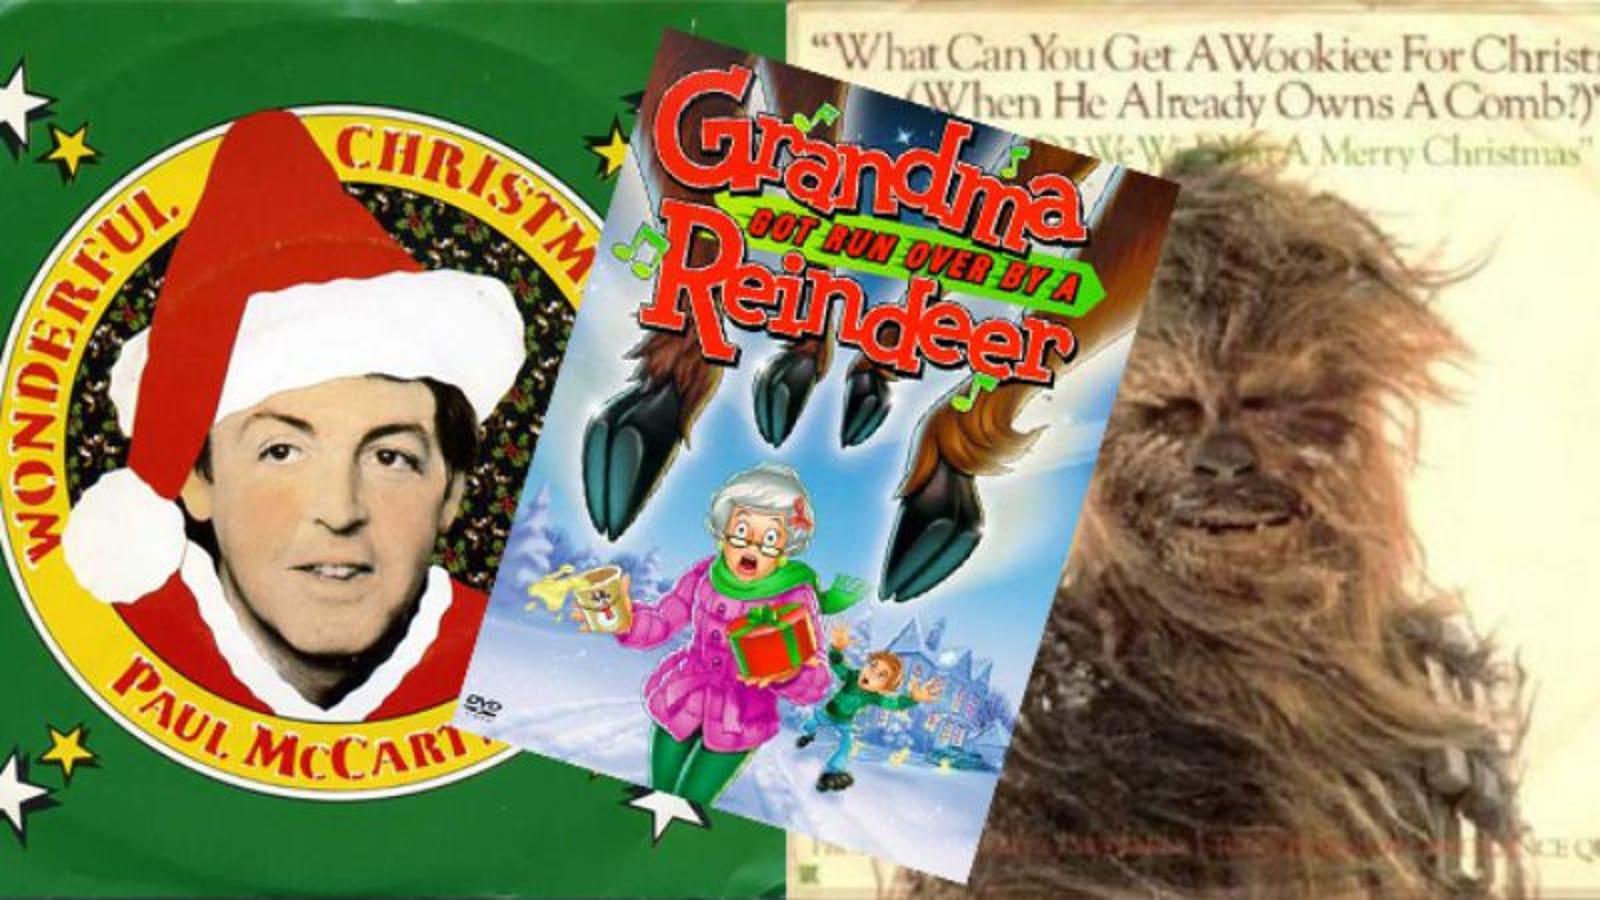 Worst Christmas music